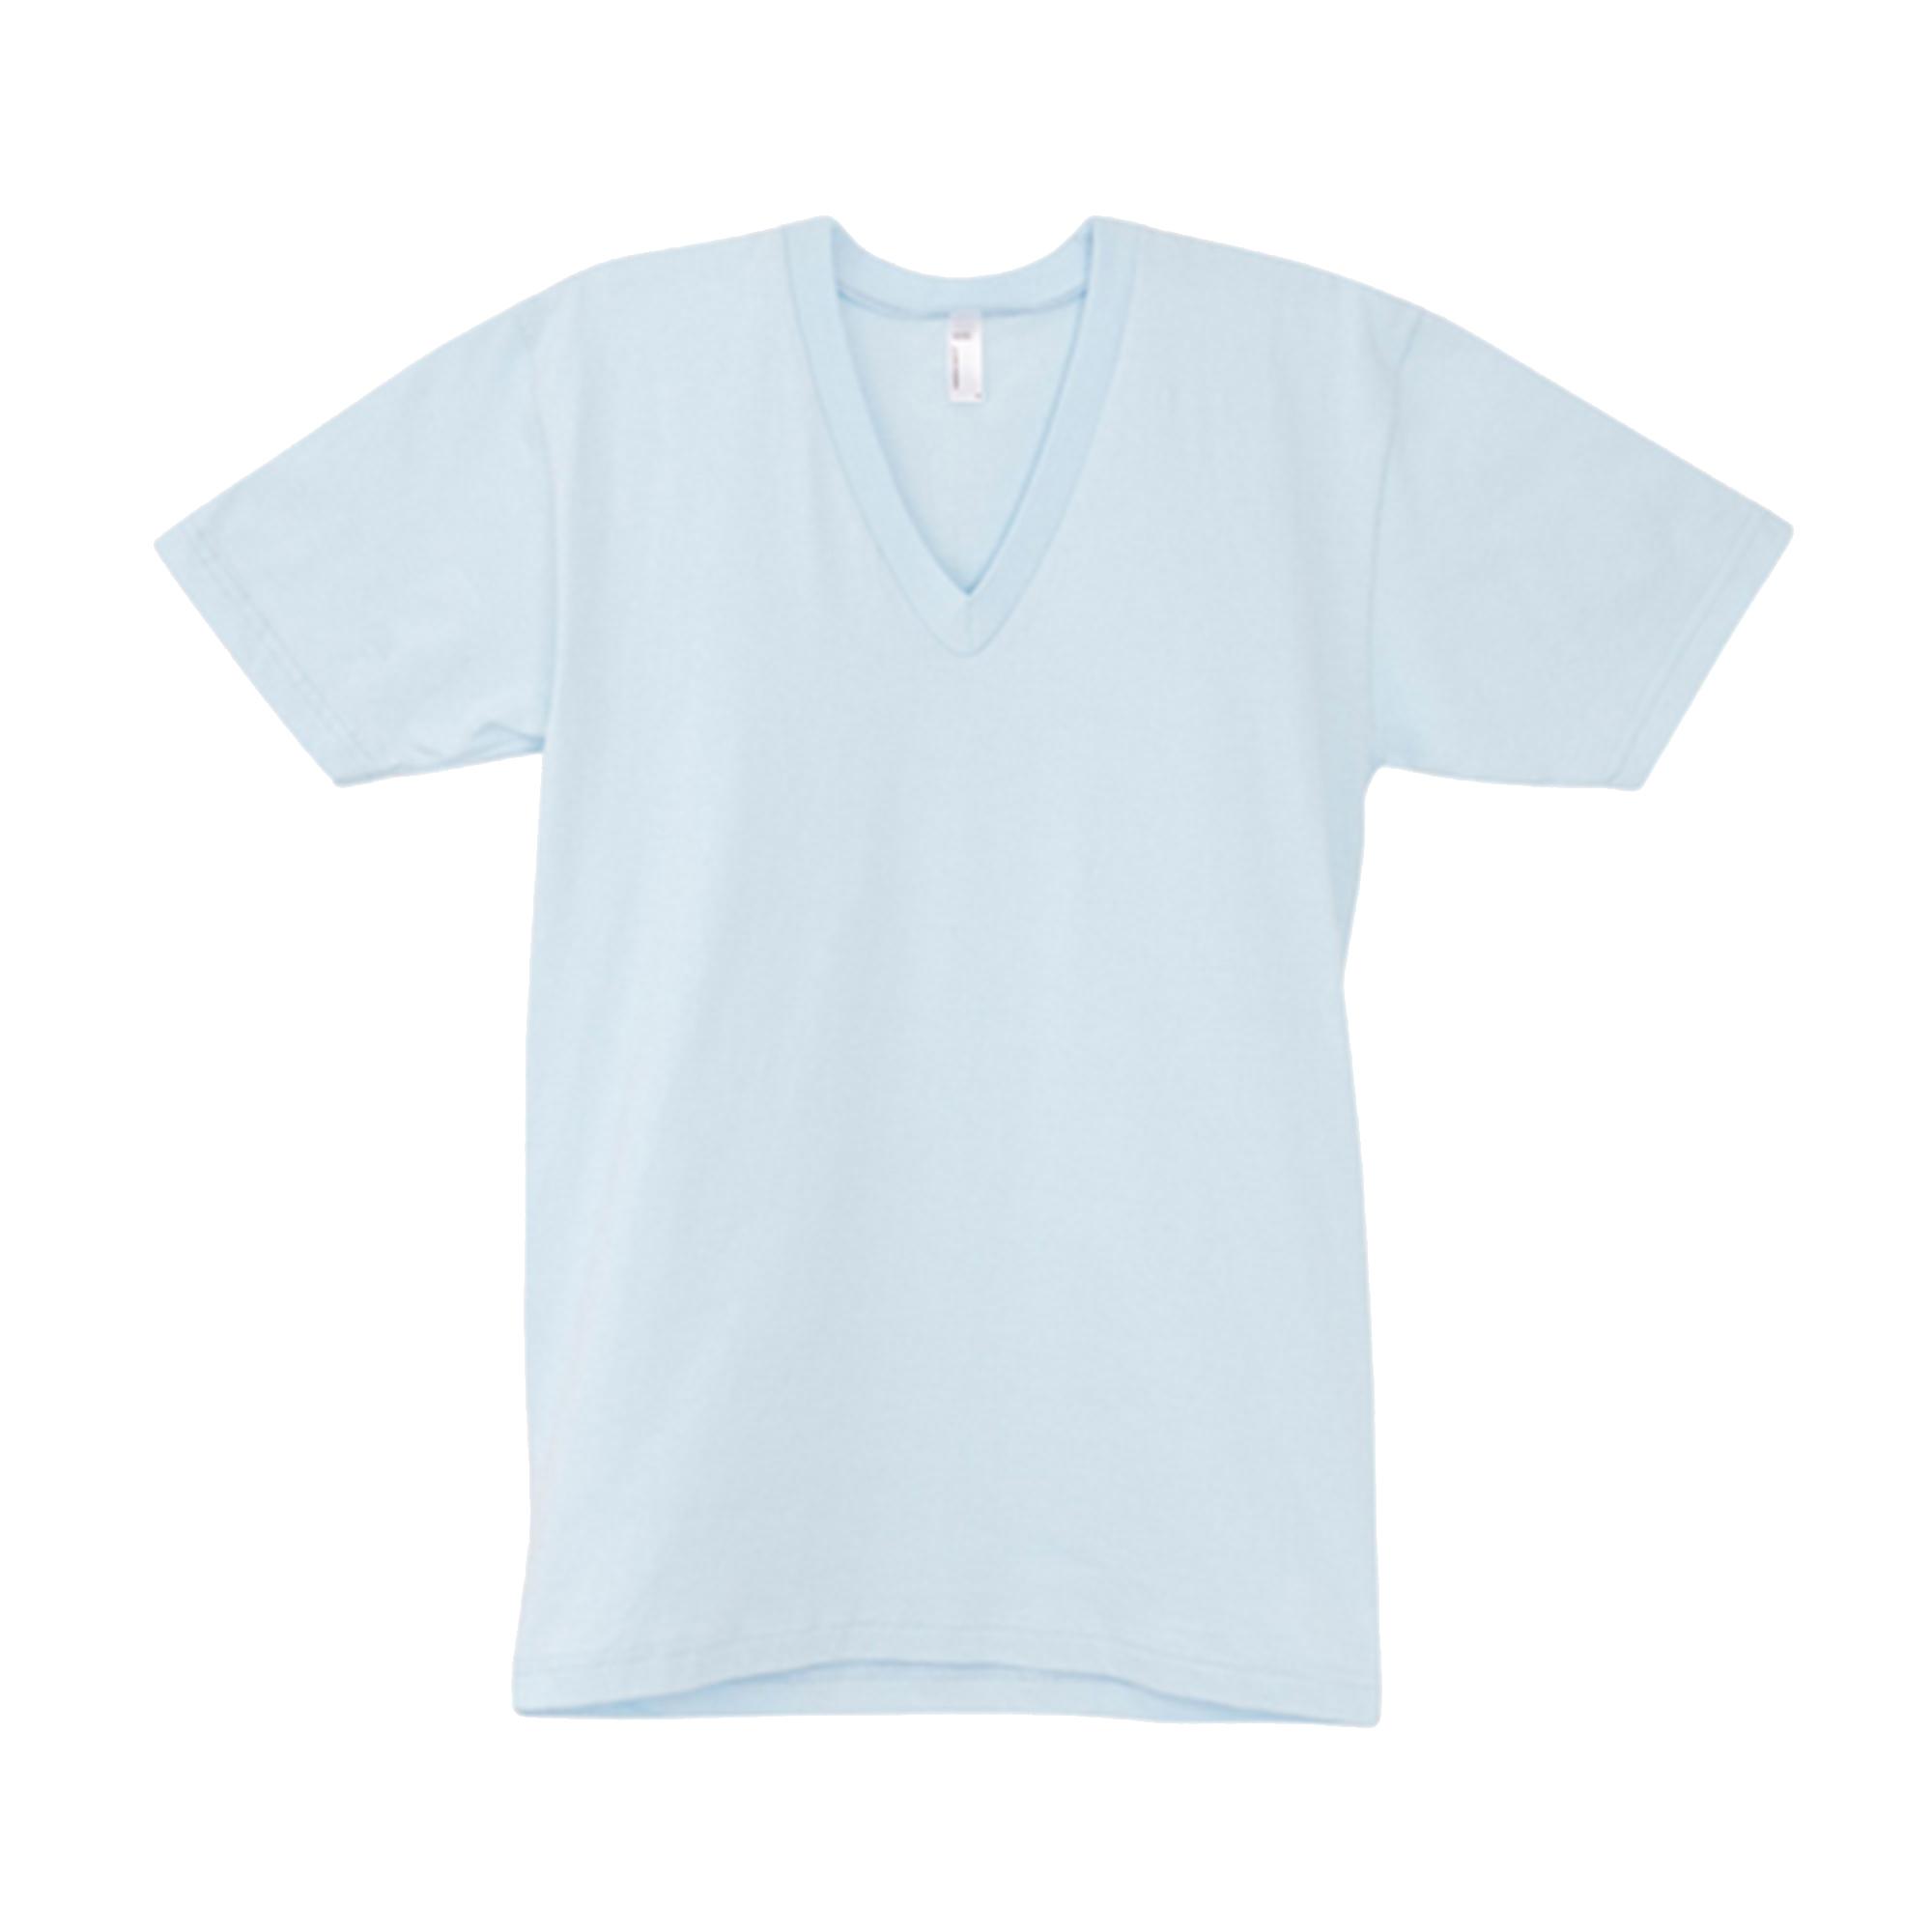 American apparel mens womens short sleeve v neck plain t for Mens plain v neck t shirts